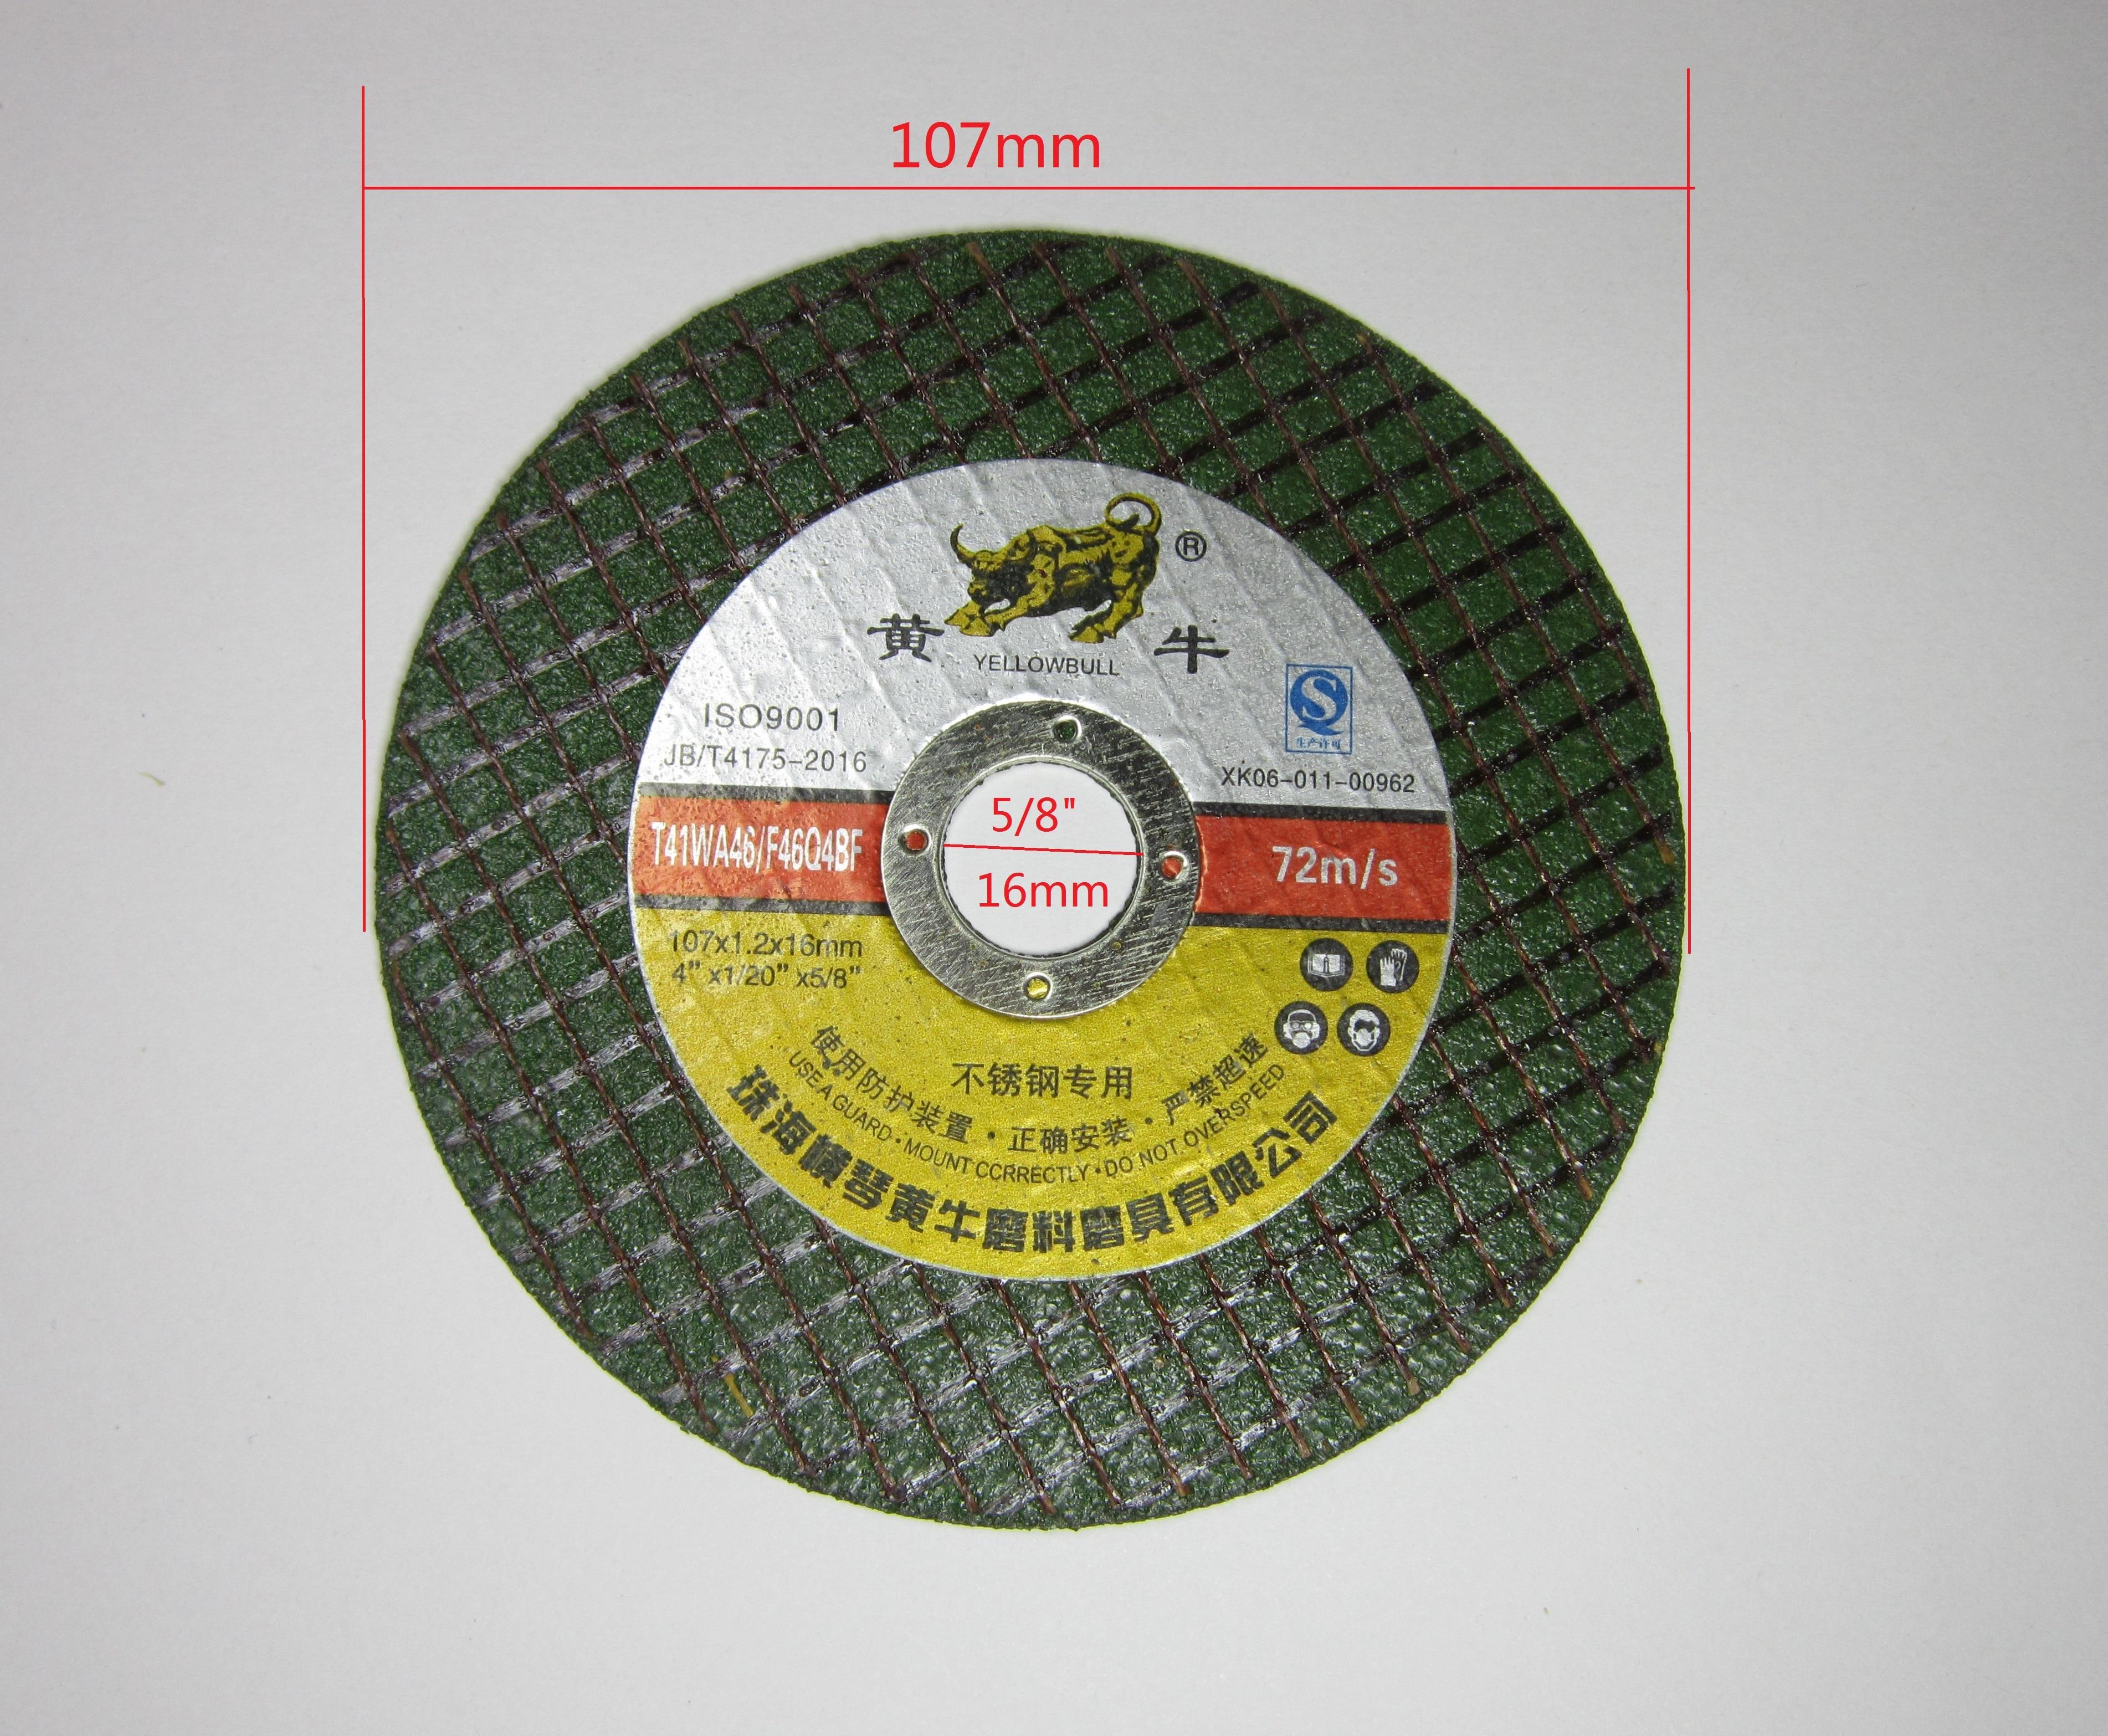 Metal Stainless steel Cutting Discs Cut Off  Wheels Ø 107mm resin Fiber Reinforced Sanding Grinding wheel Electric Angle Grinder